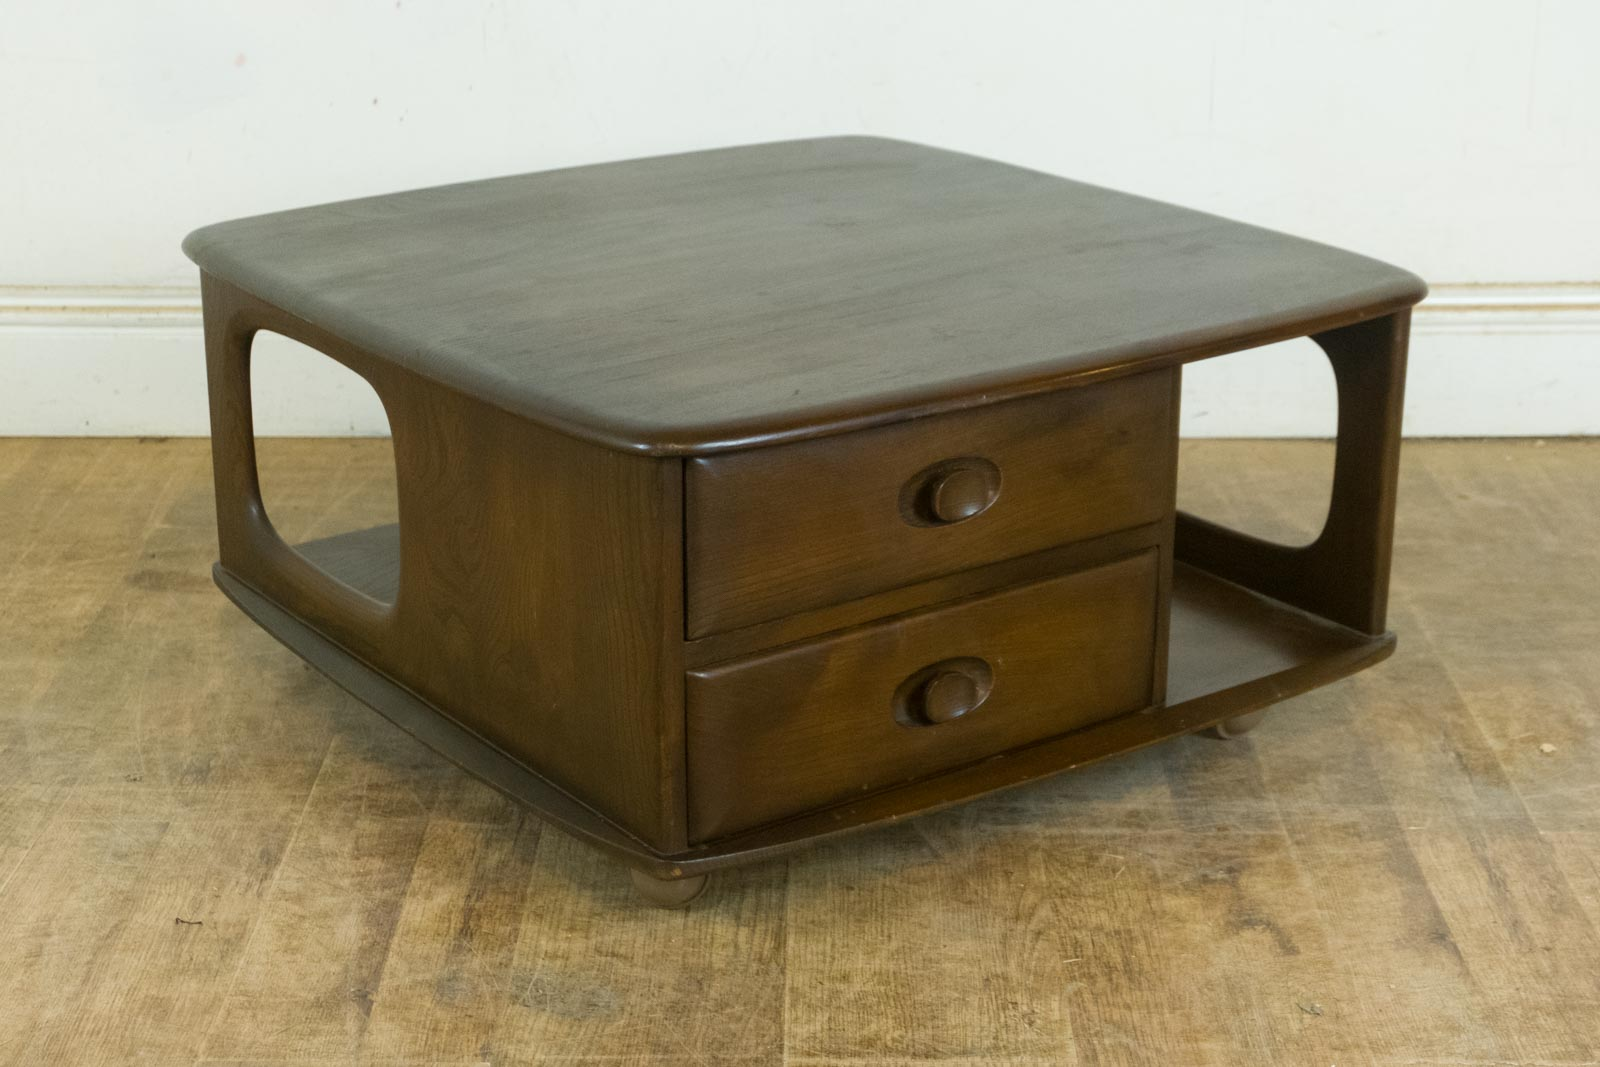 Vintage Retro Ercol Dark Elm Pandora Box Coffee Table eBay : HV250606 6 from www.ebay.co.uk size 1600 x 1067 jpeg 174kB